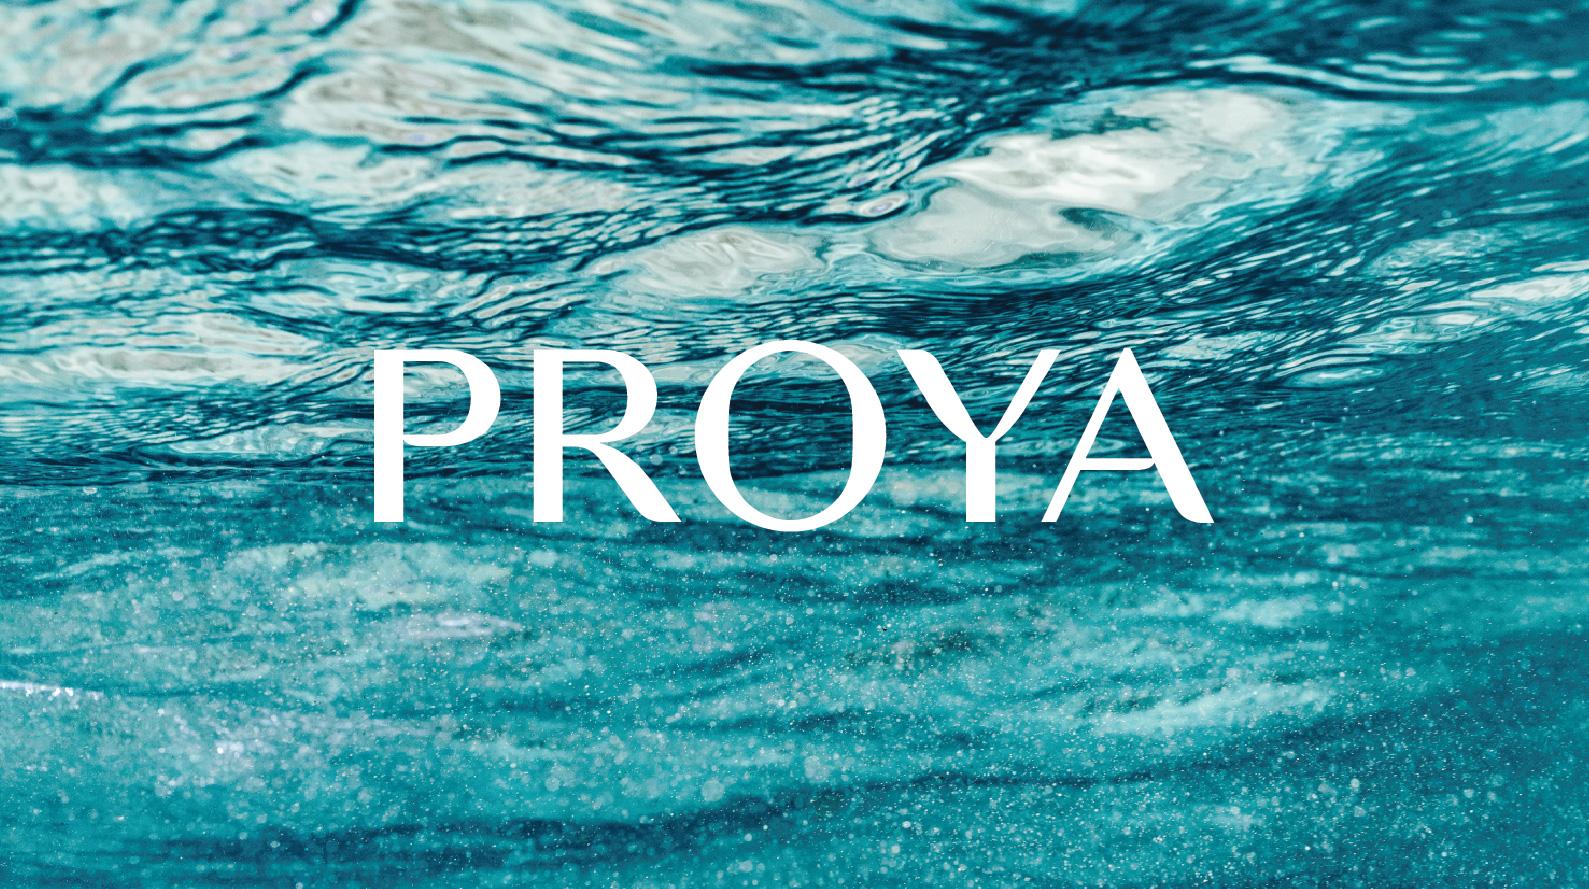 proya_00-3.jpg